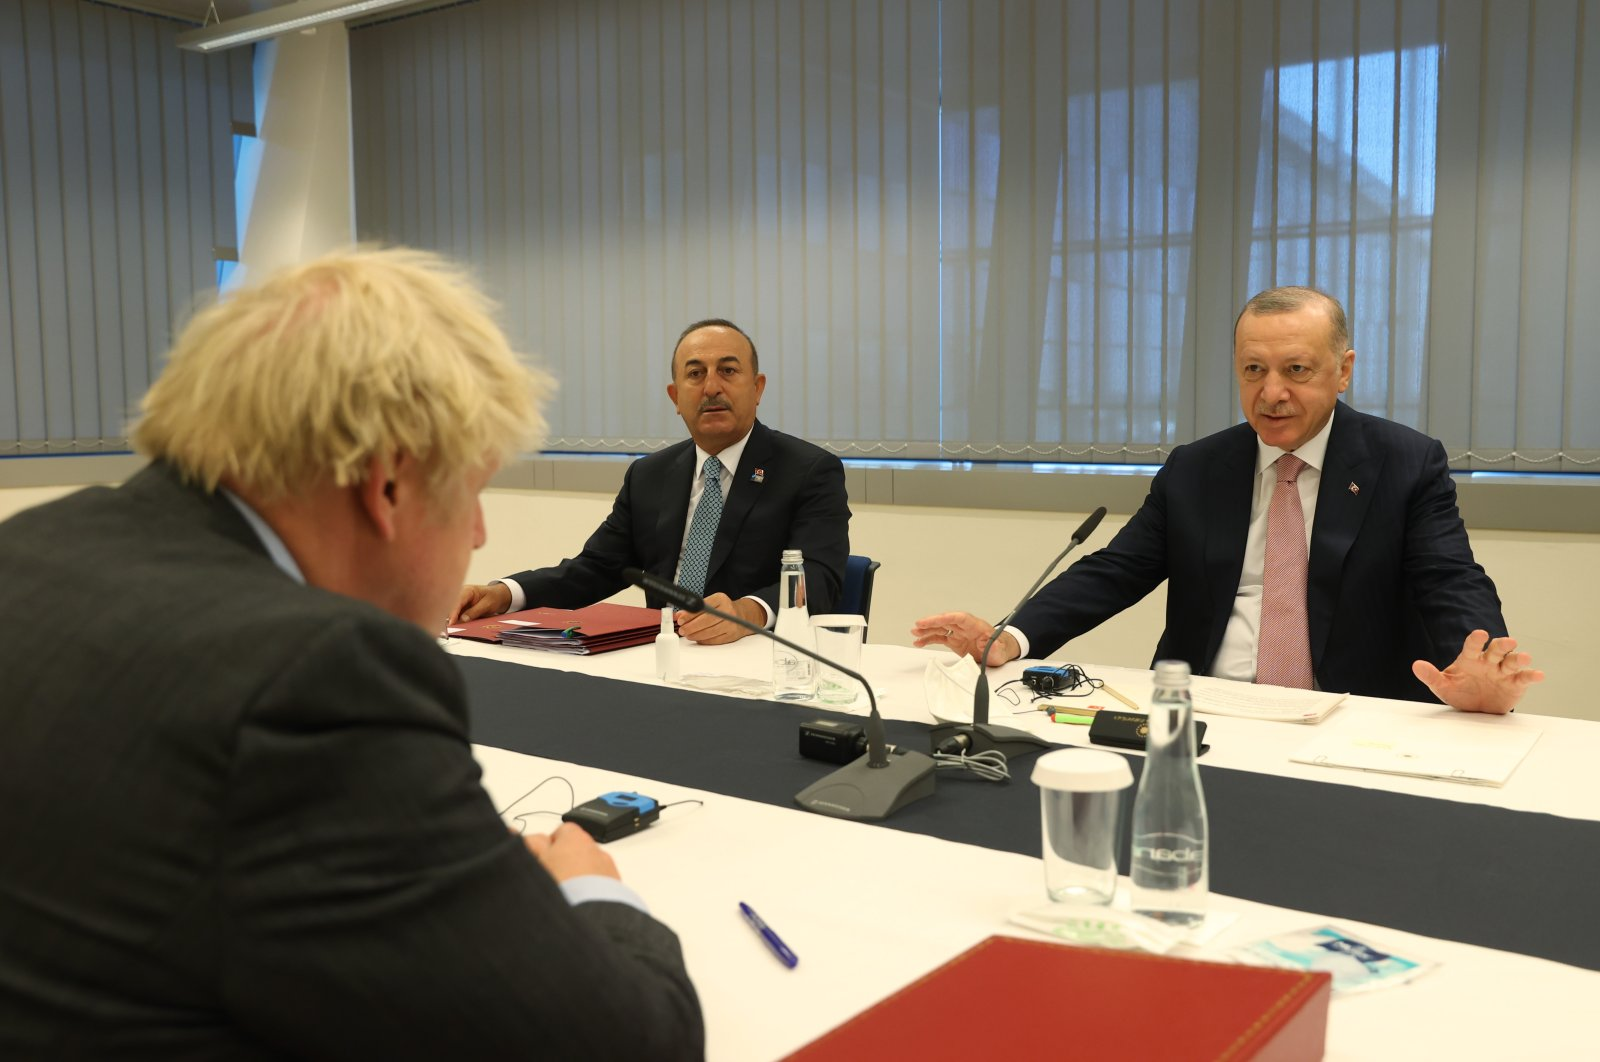 President Recep Tayyip Erdoğan (R), Foreign Minister Mevlüt Çavuşoğlu and British Prime Minister Boris Johnson meeton the sidelines of the NATO summit in Brussels, Belgium, June 14, 2021. (AA Photo)